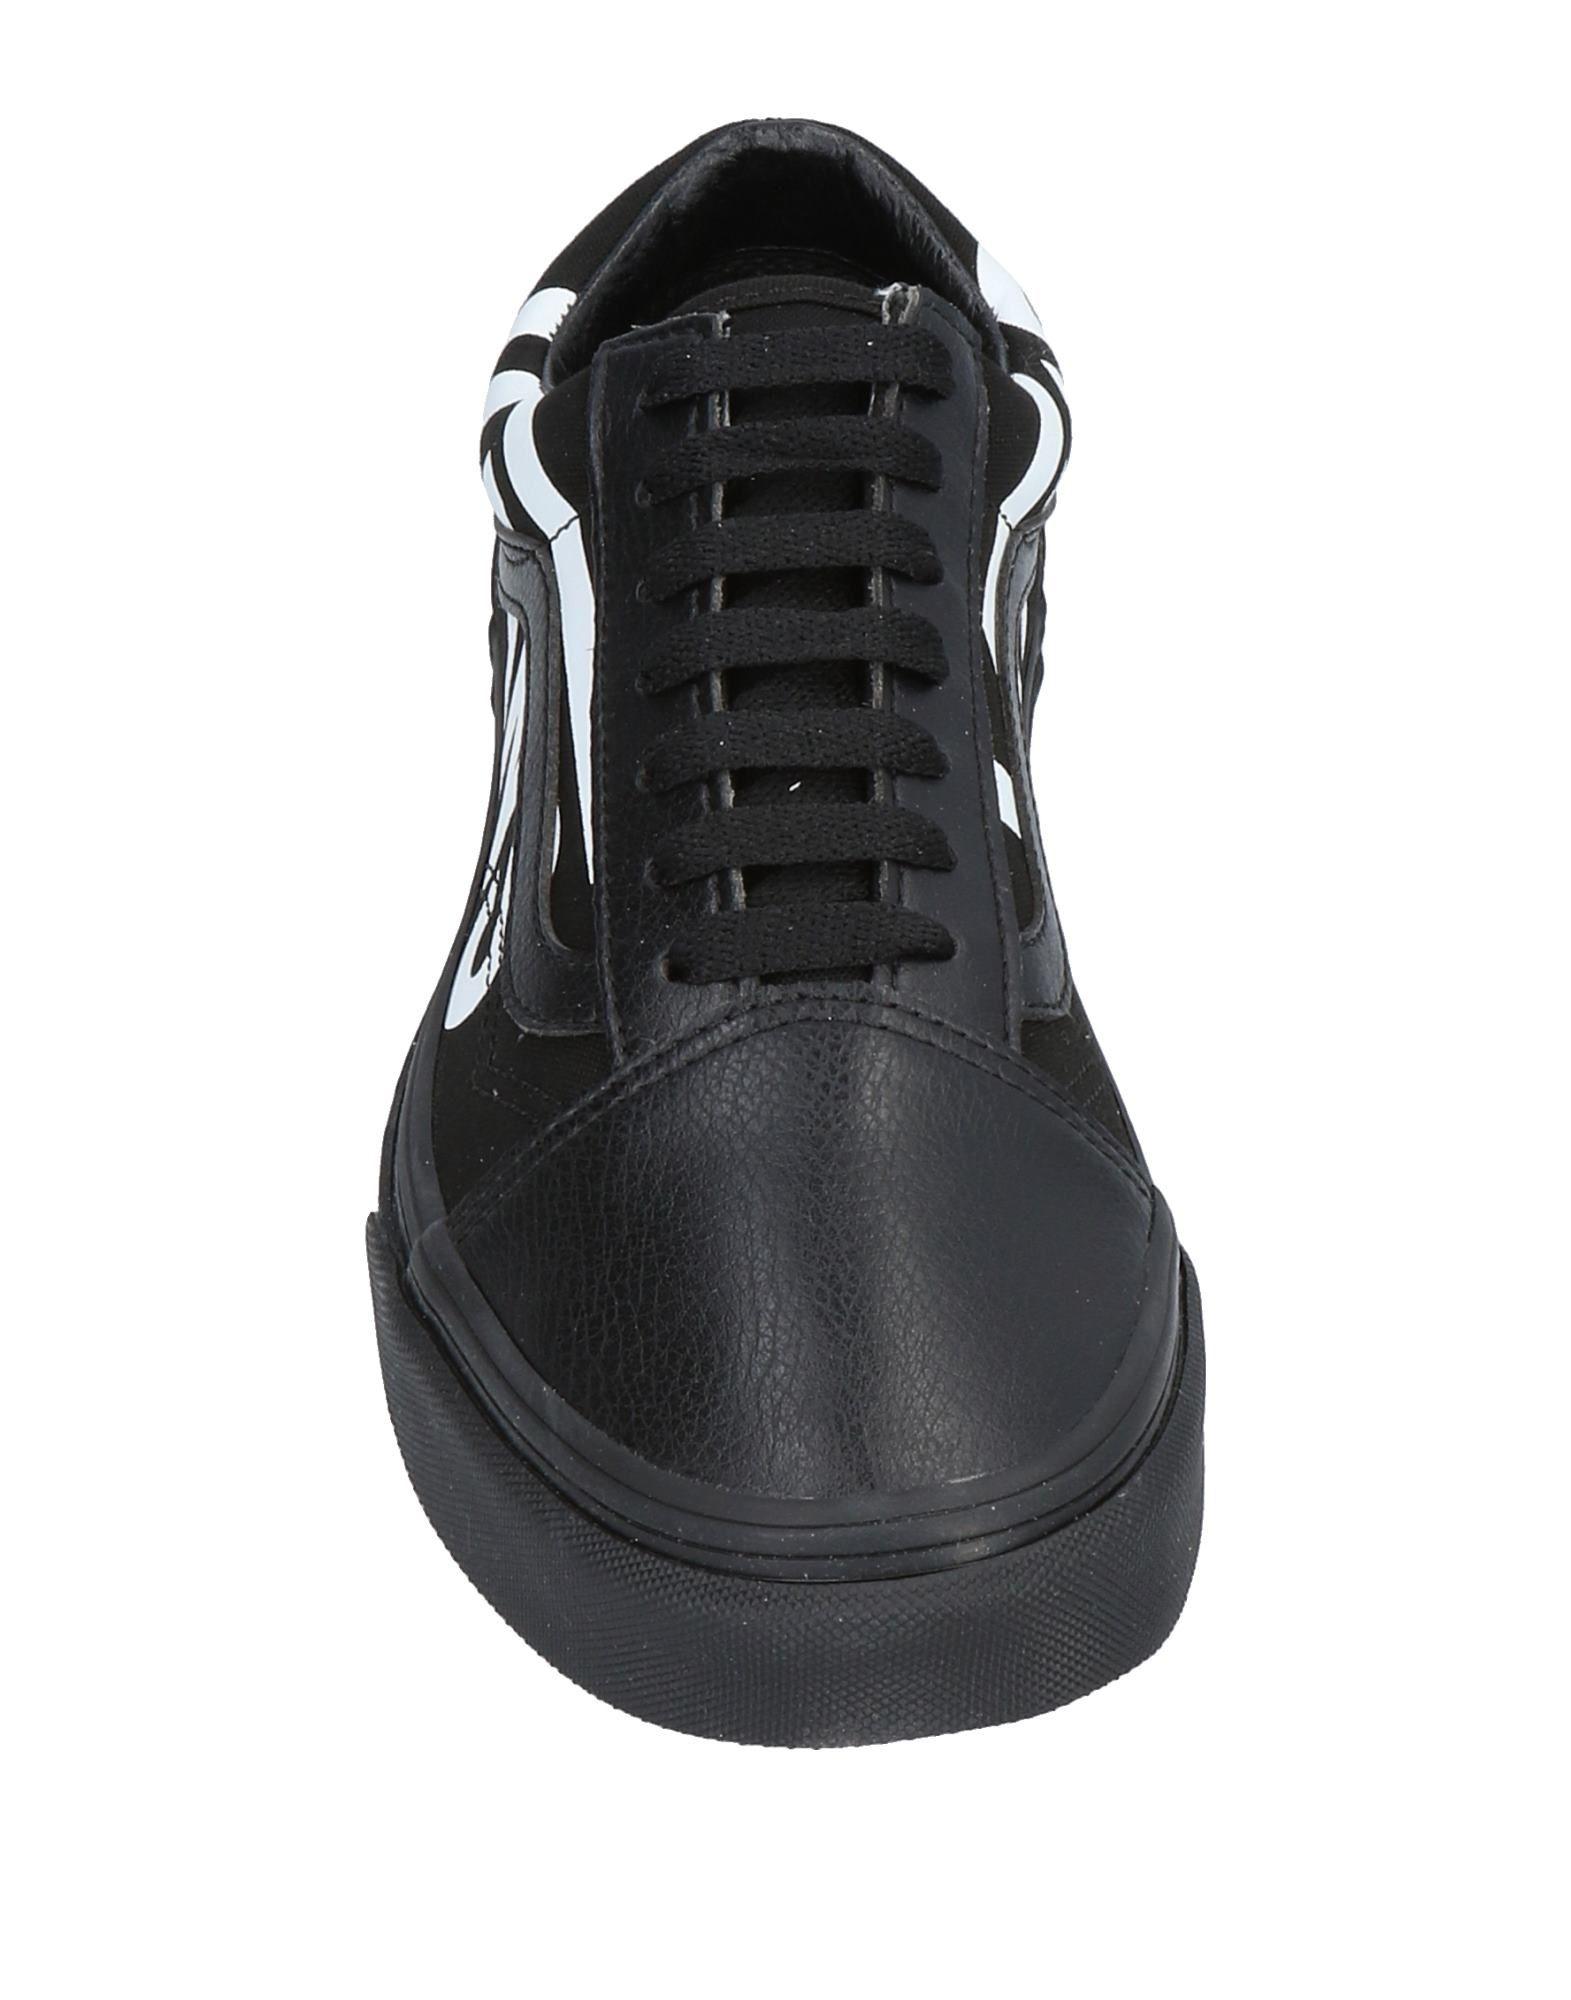 Vans Sneakers Damen   Damen 11492234JO 61b986